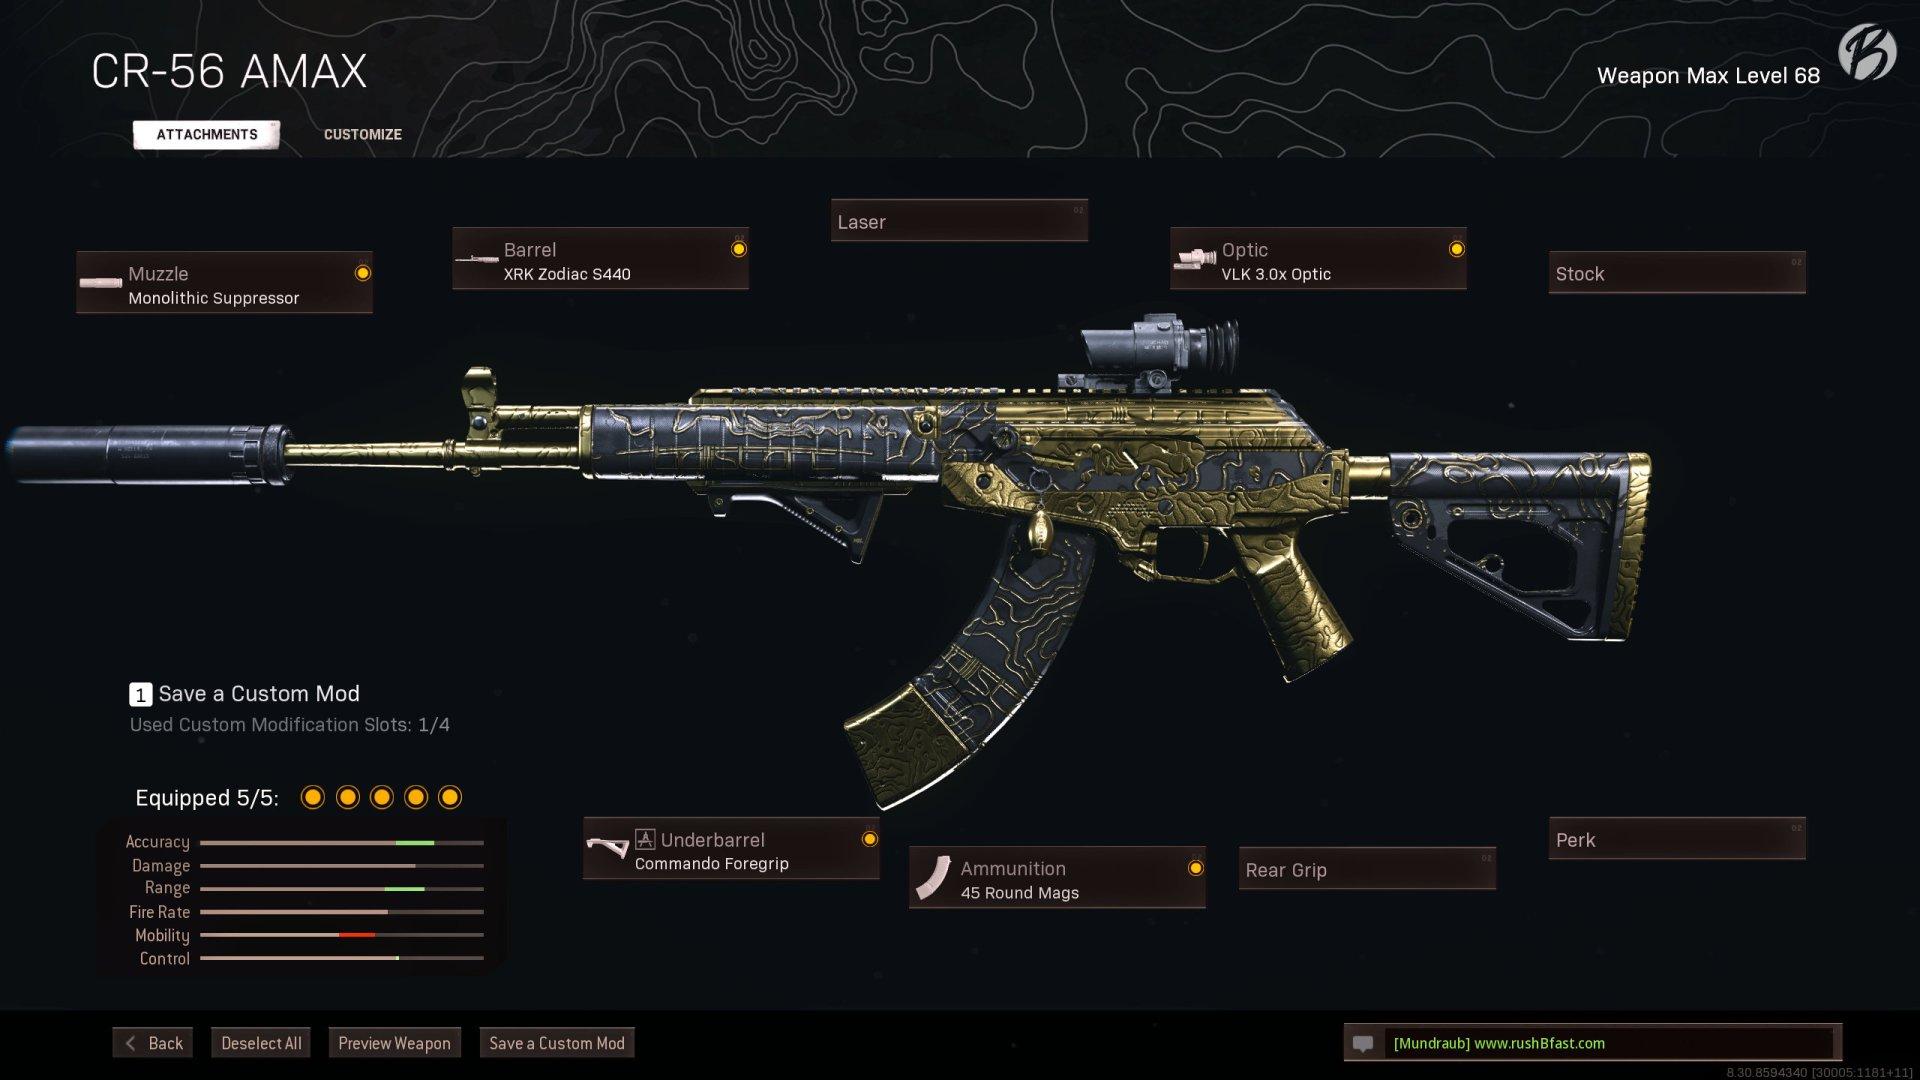 Call of Duty Warzone - Cold War Season 1 - CR-56 AMAX